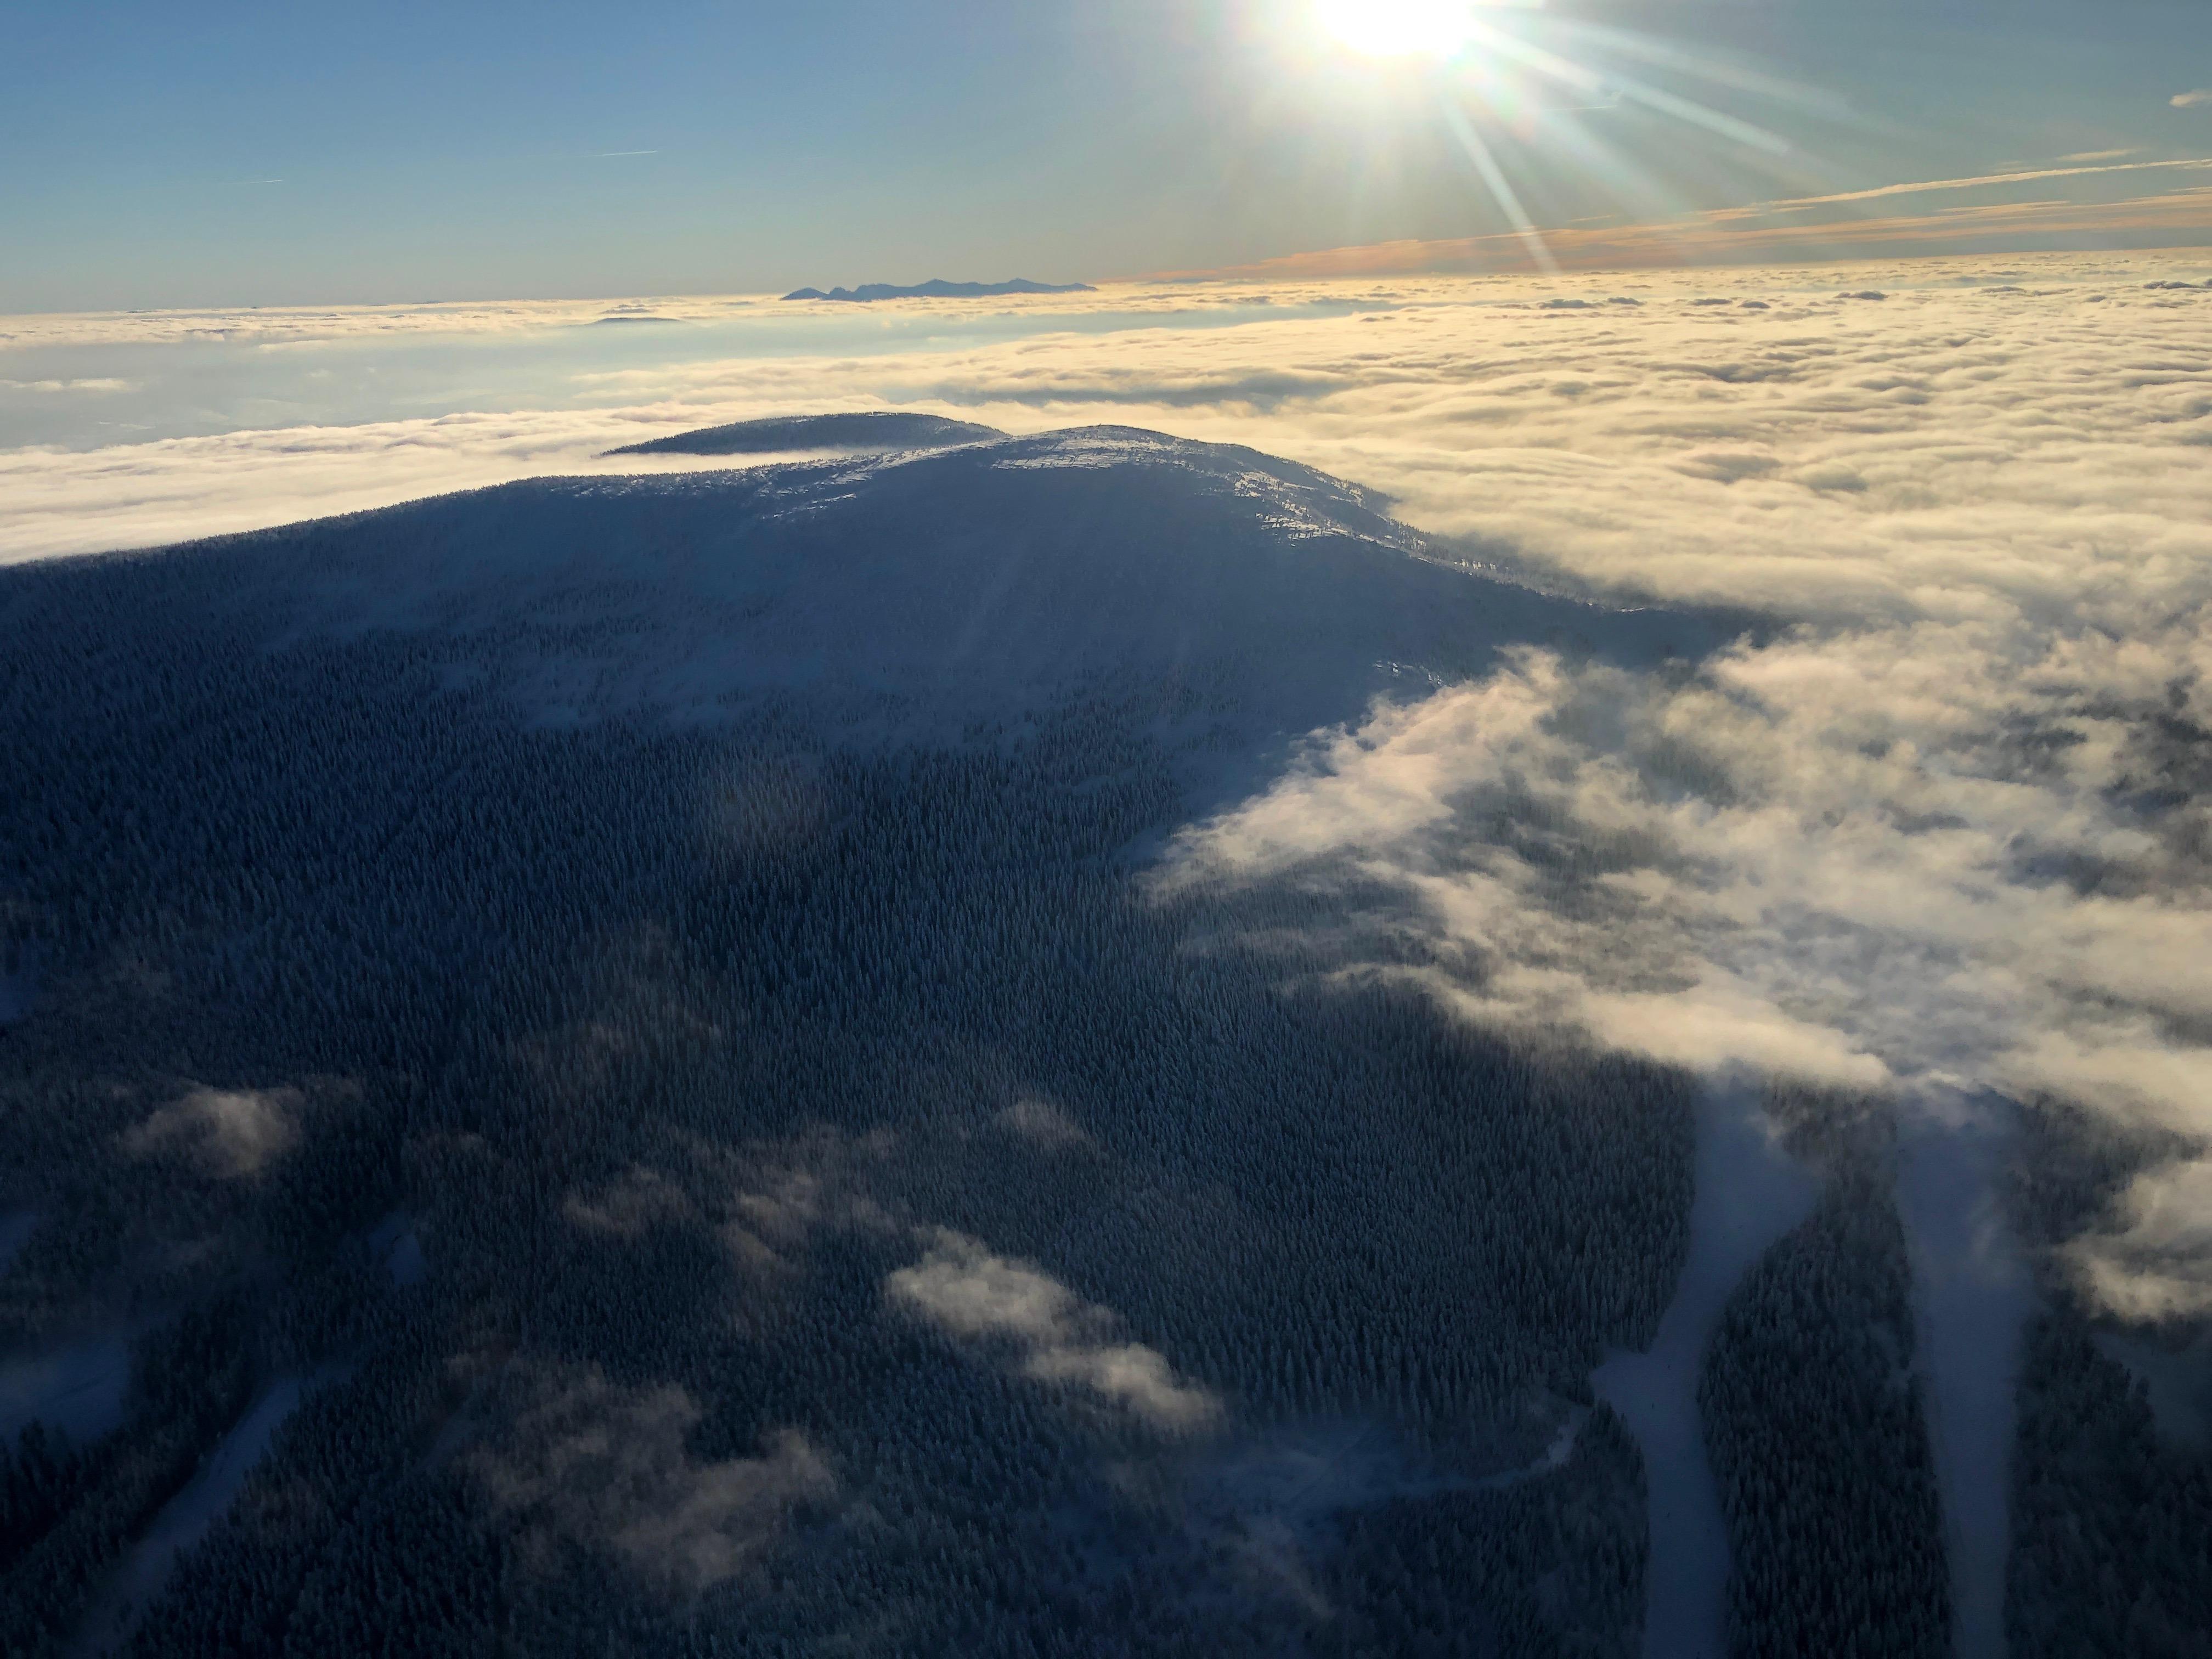 Loty widokowe Helipoland